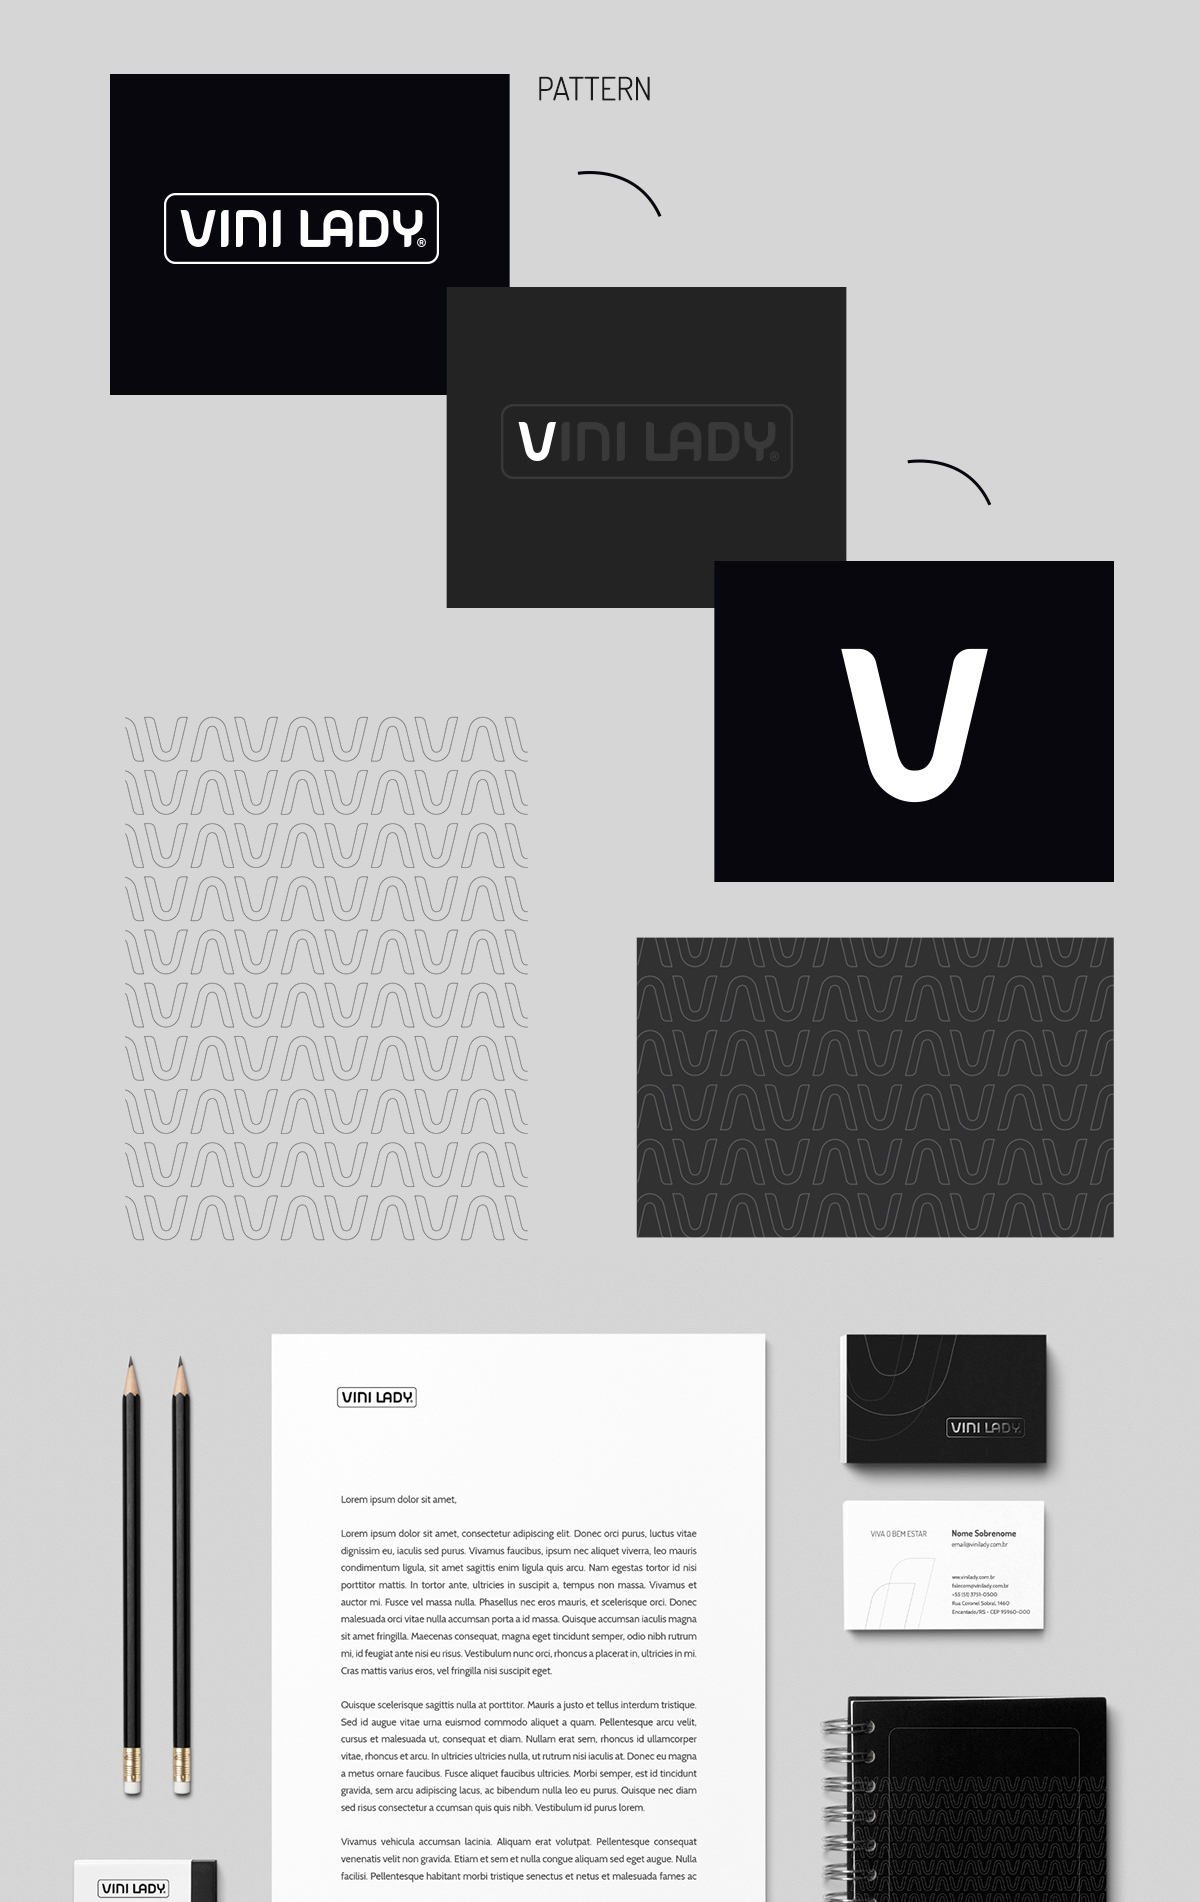 manual-padrao-identidade-visual-agencia-criacao-toyz-vini-lady pattern